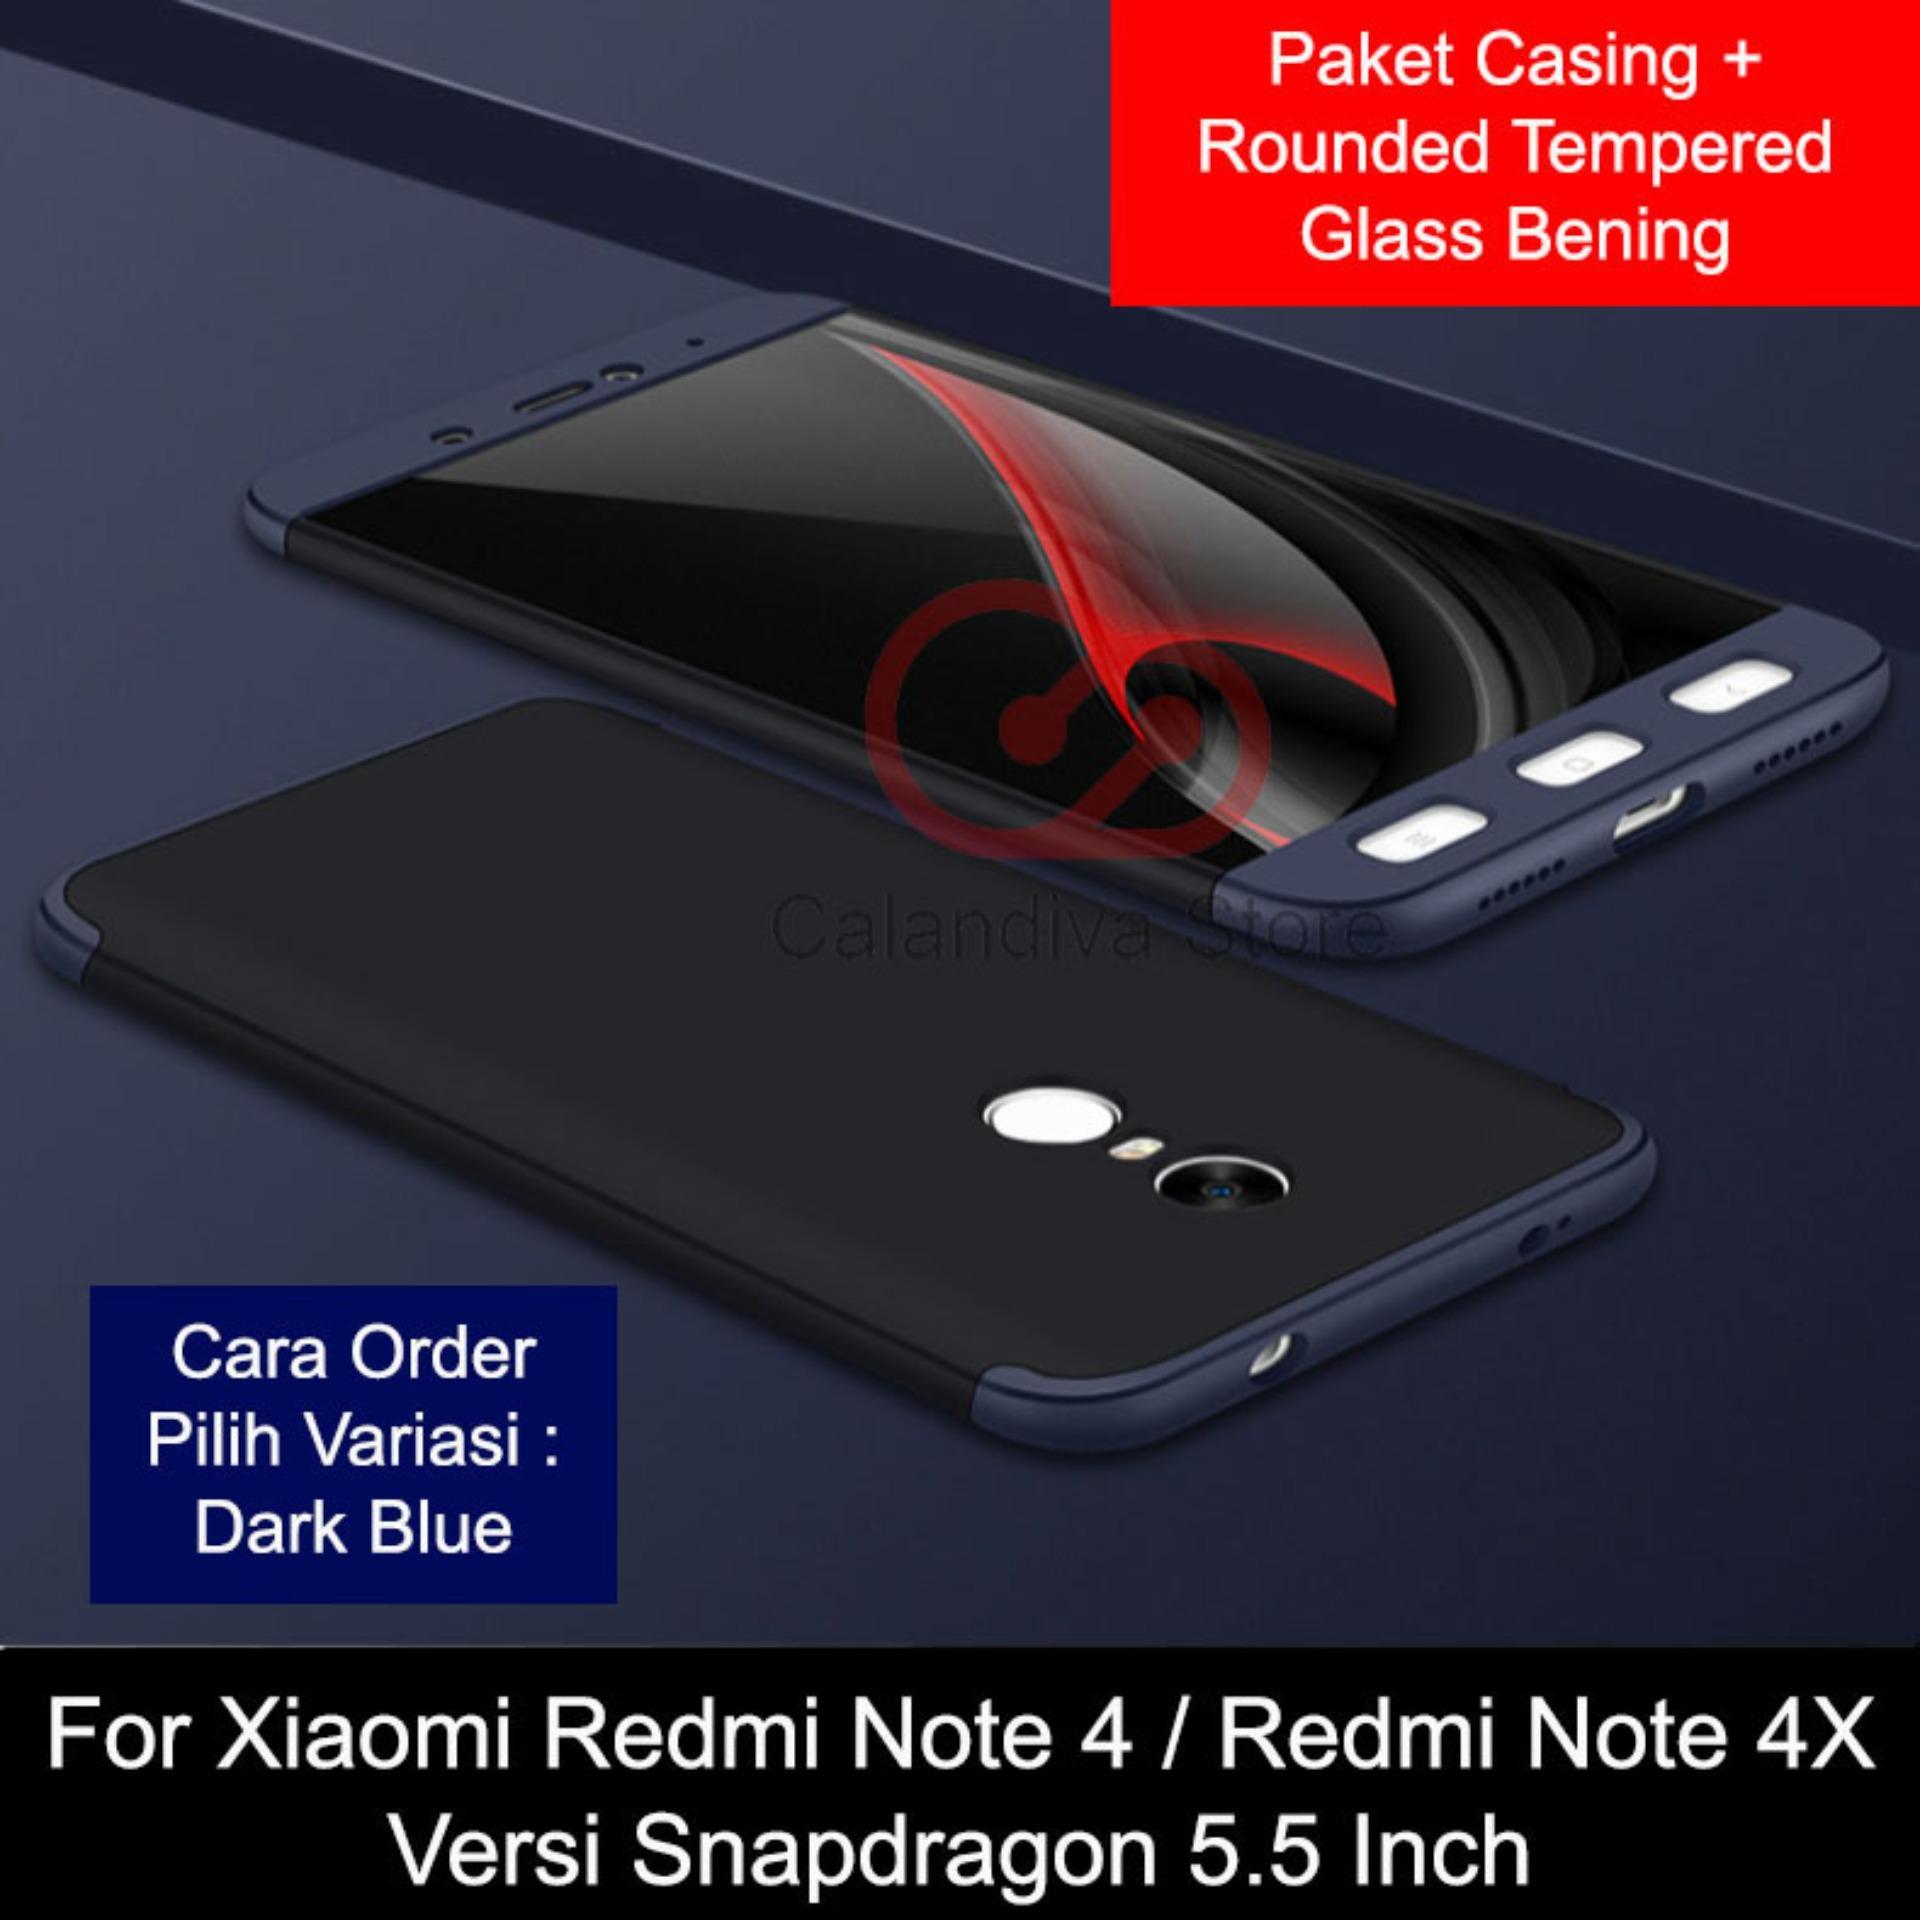 Calandiva Case Xiaomi Redmi Note 4X Snapdragon , Redmi Note 4 Snapdragon (5.5 inch) (sama ukuran) Casing Premium Front Back 360 Degree Full Protection + ...